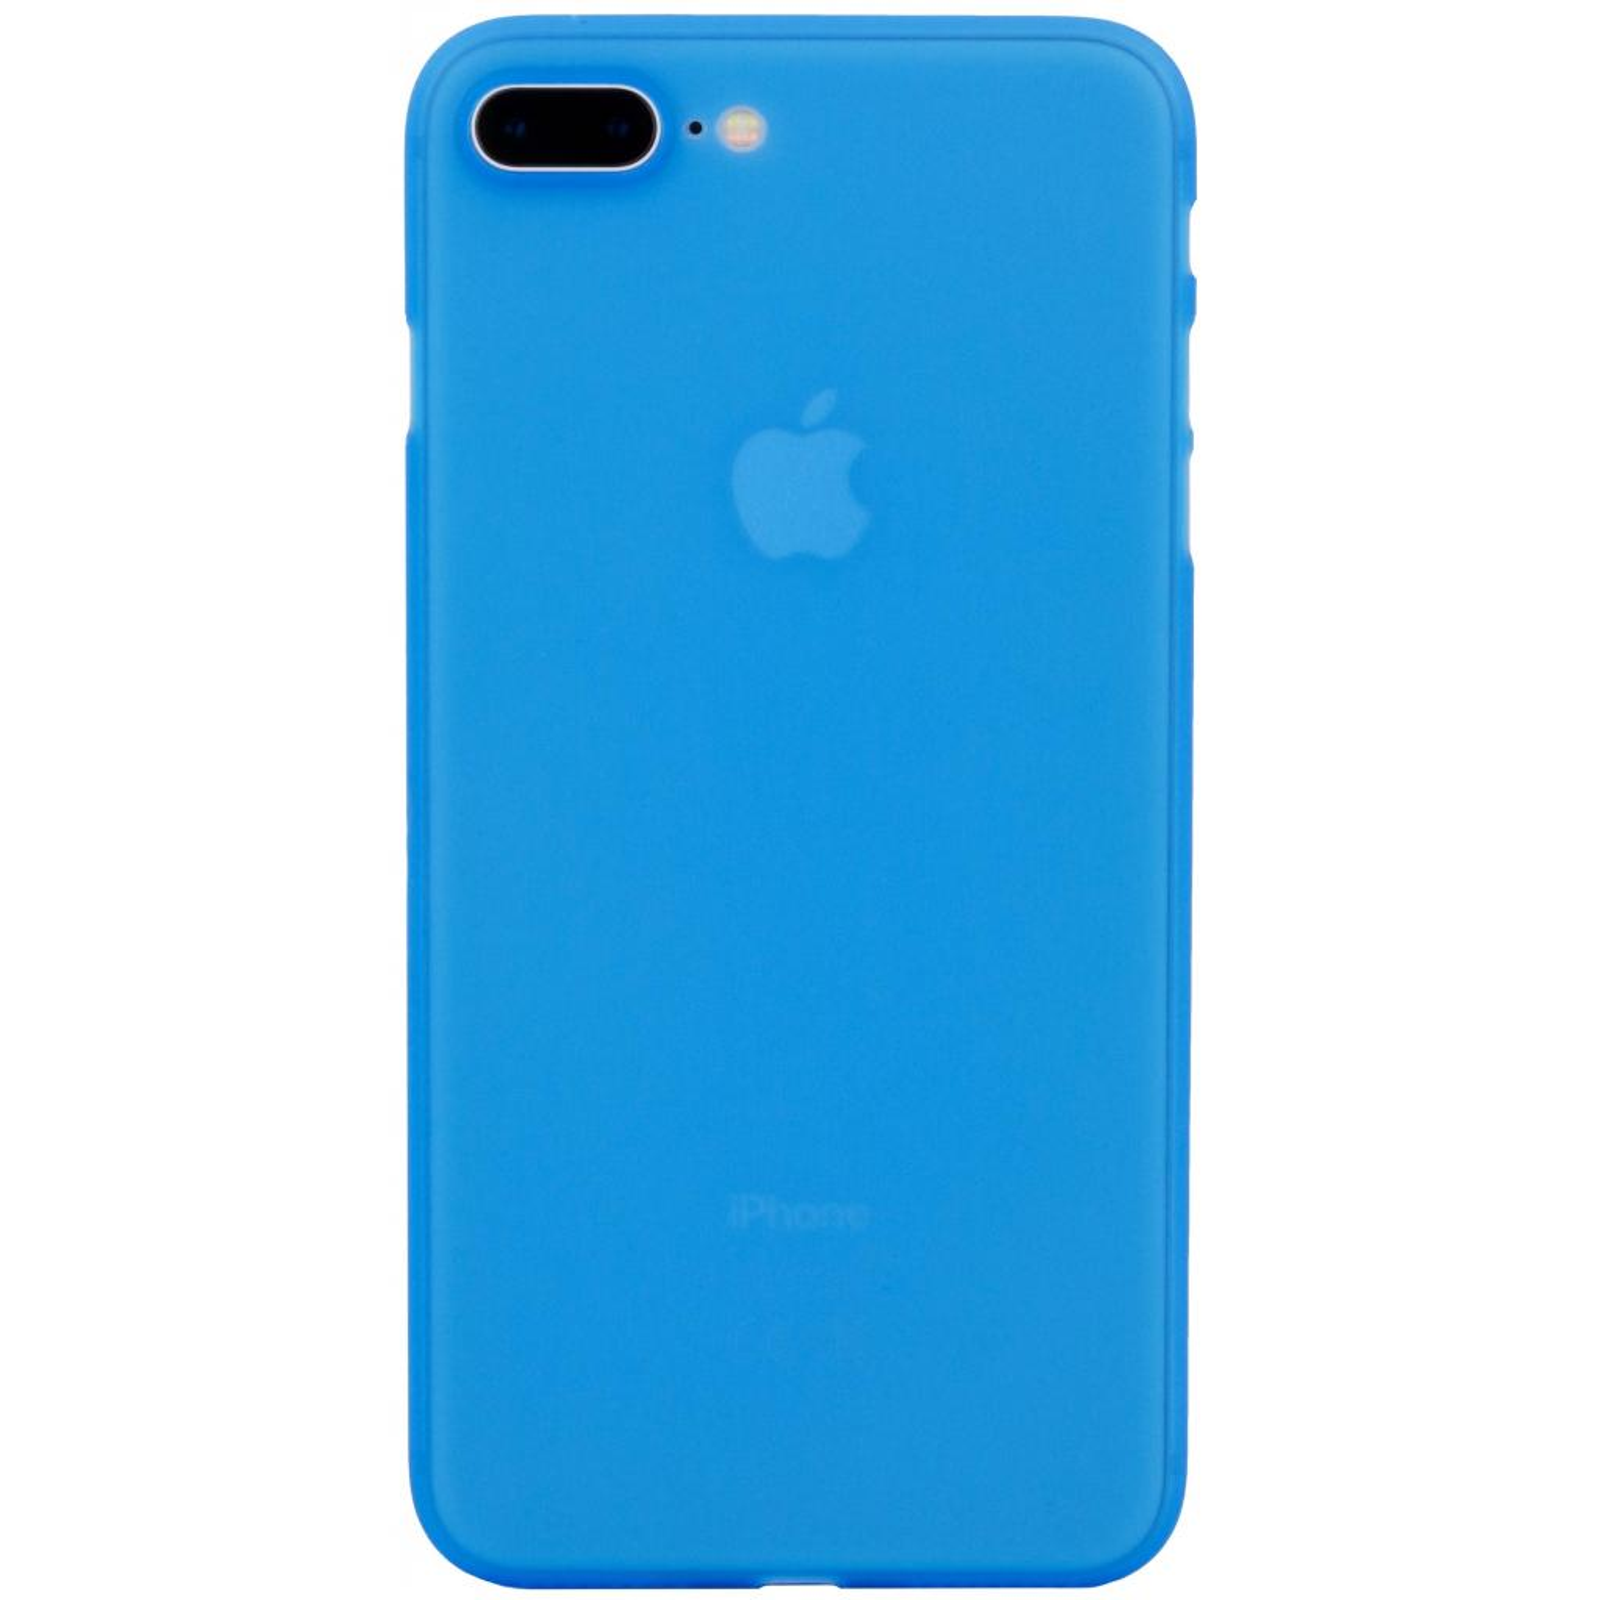 Чехол для моб. телефона MakeFuture PP/Ice Case для Apple iPhone 8 Plus Blue (MCI-AI8PBL)